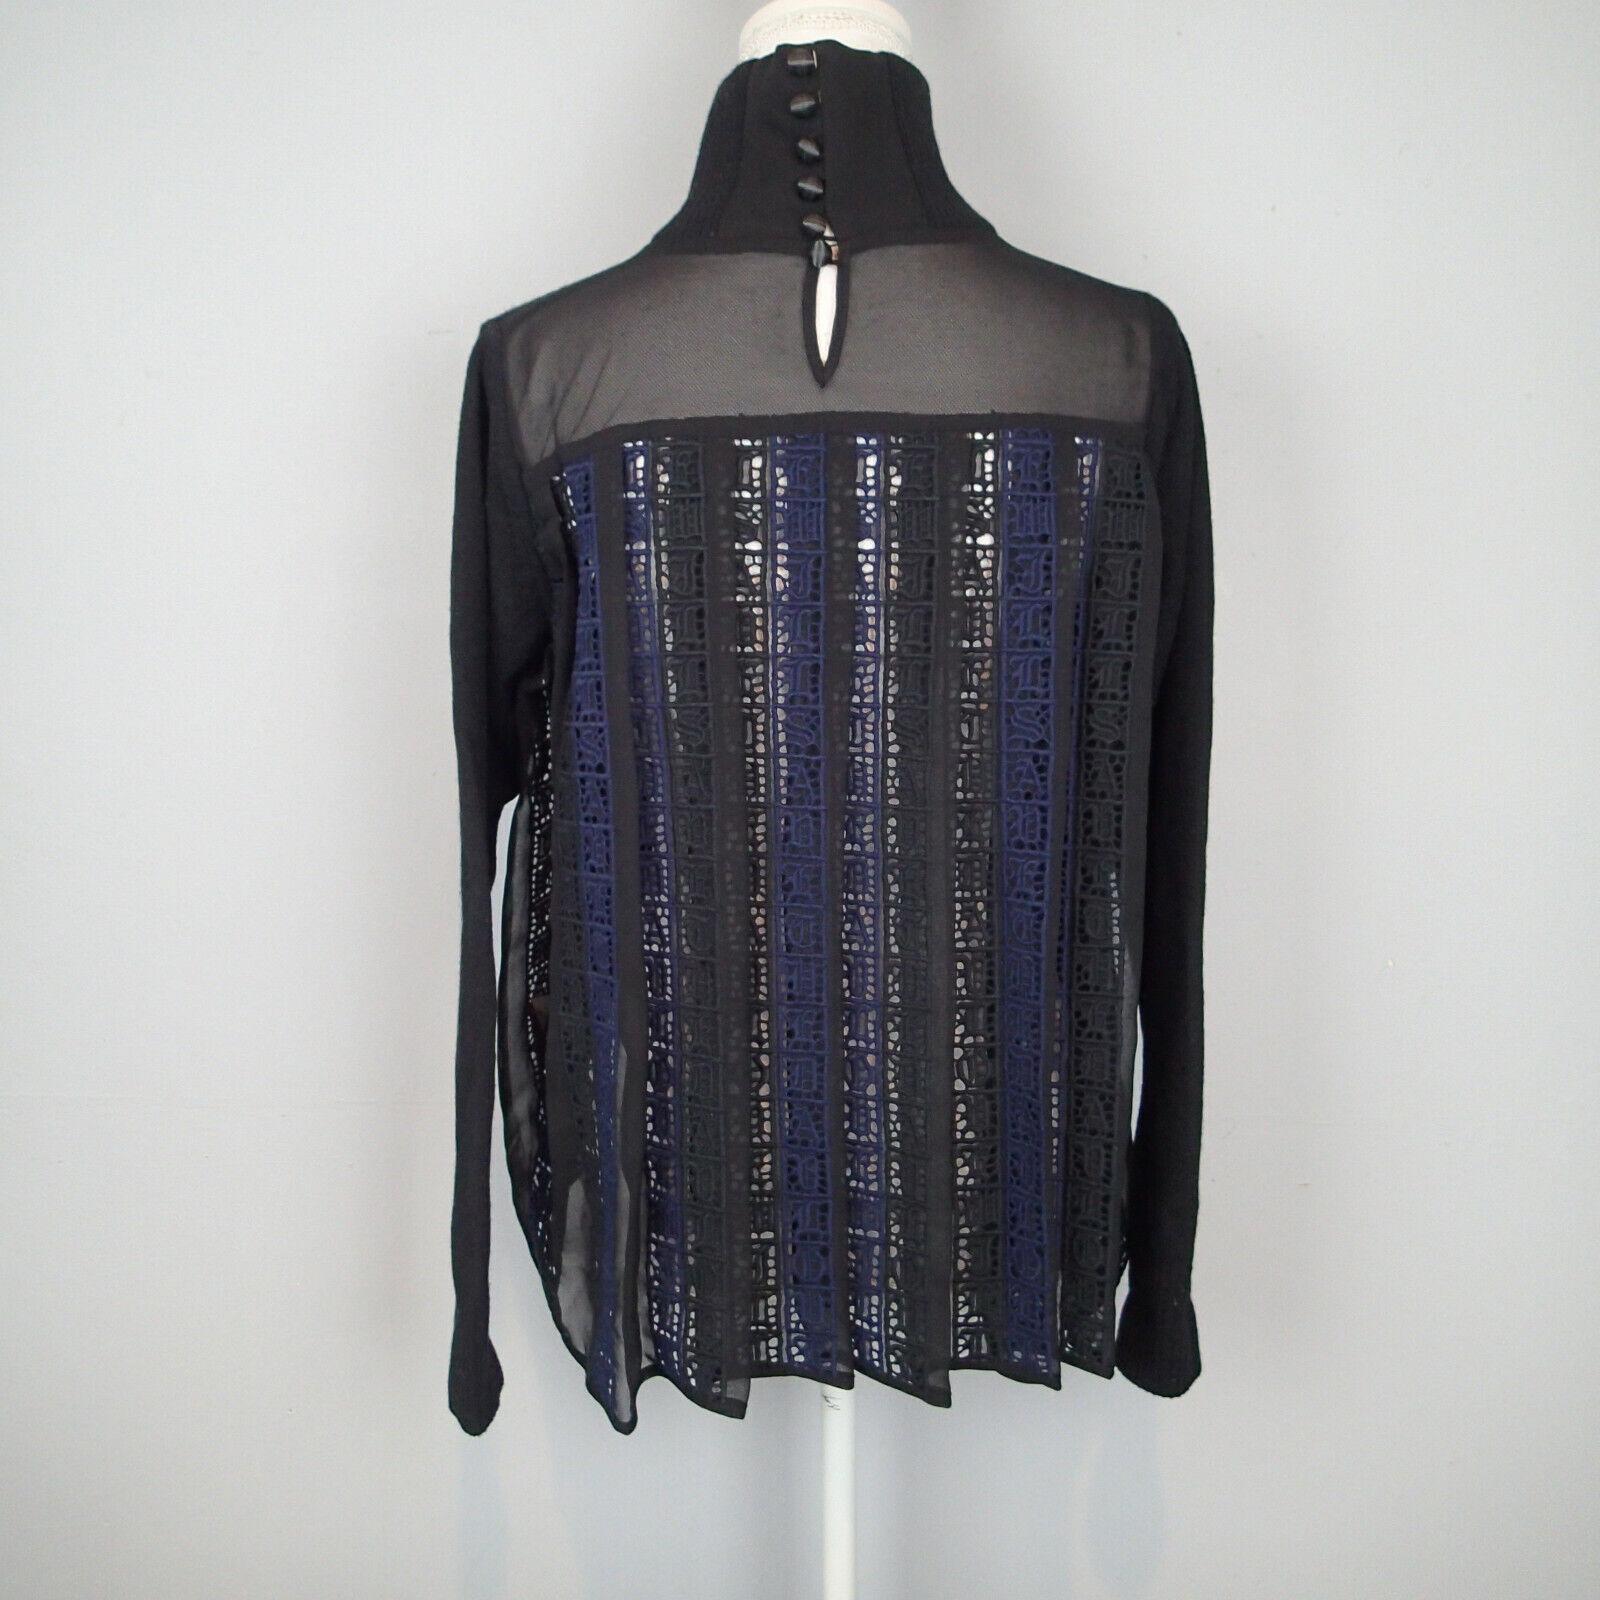 Sacai ikram Knit Tee crochet schwarz navy Sz 2 wool bl spellout sweater blouse r7